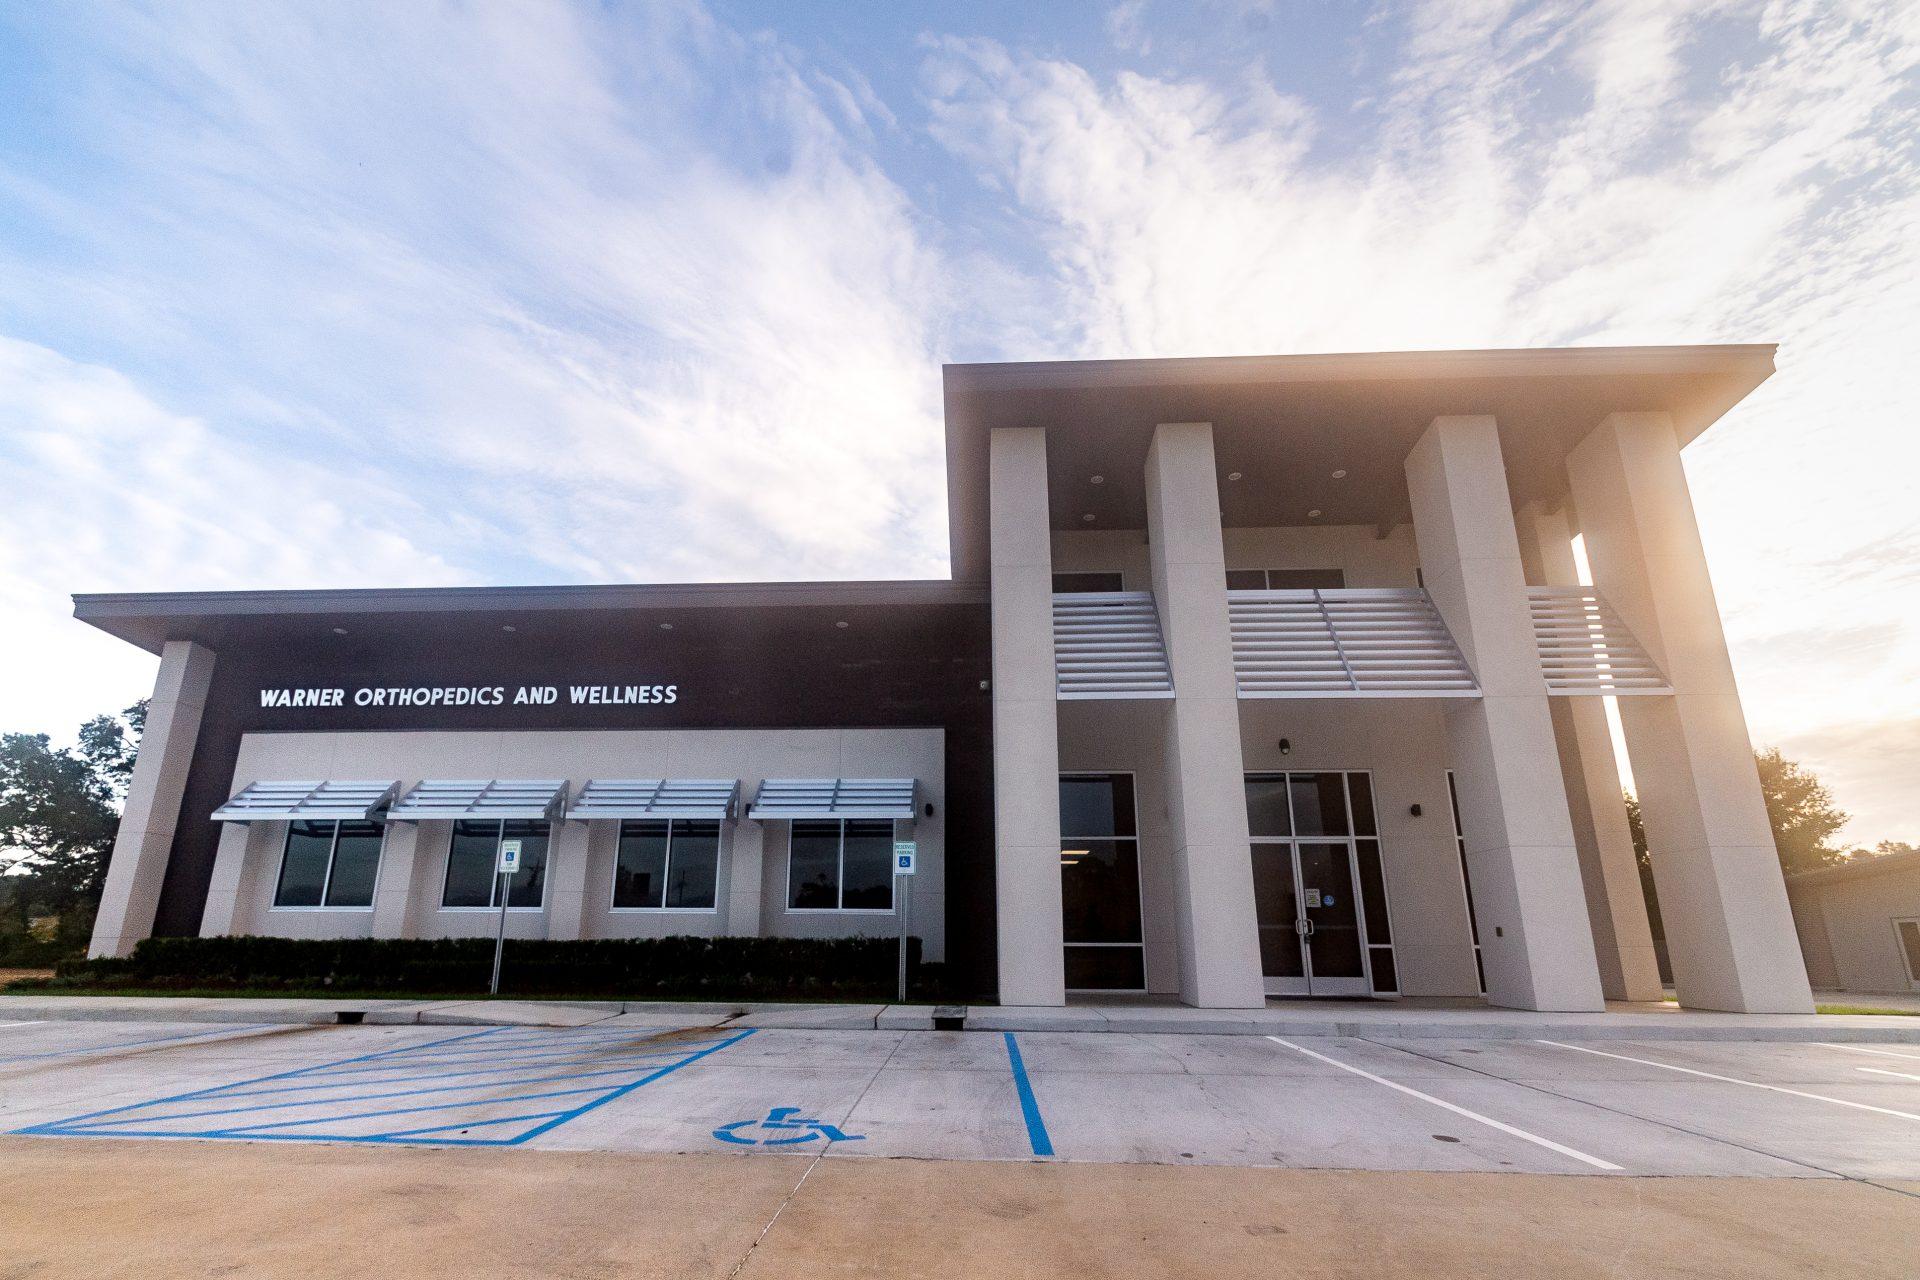 Warner Orthopedics and Wellness Baton Rouge